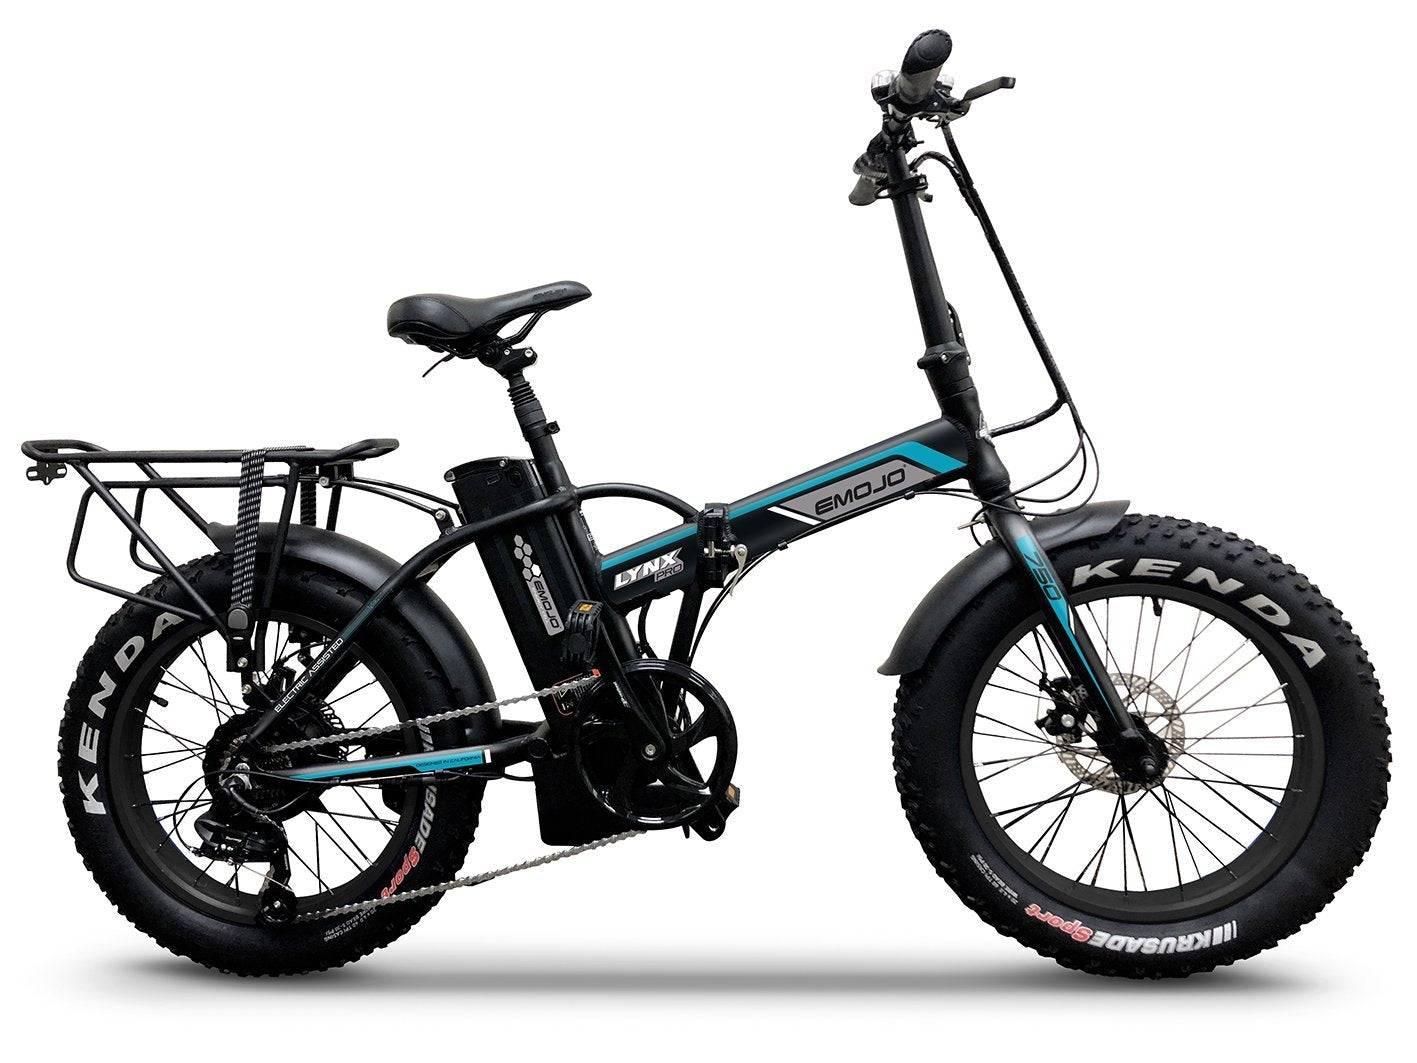 Emojo Lynx PRO 750 Folding Electric Bike